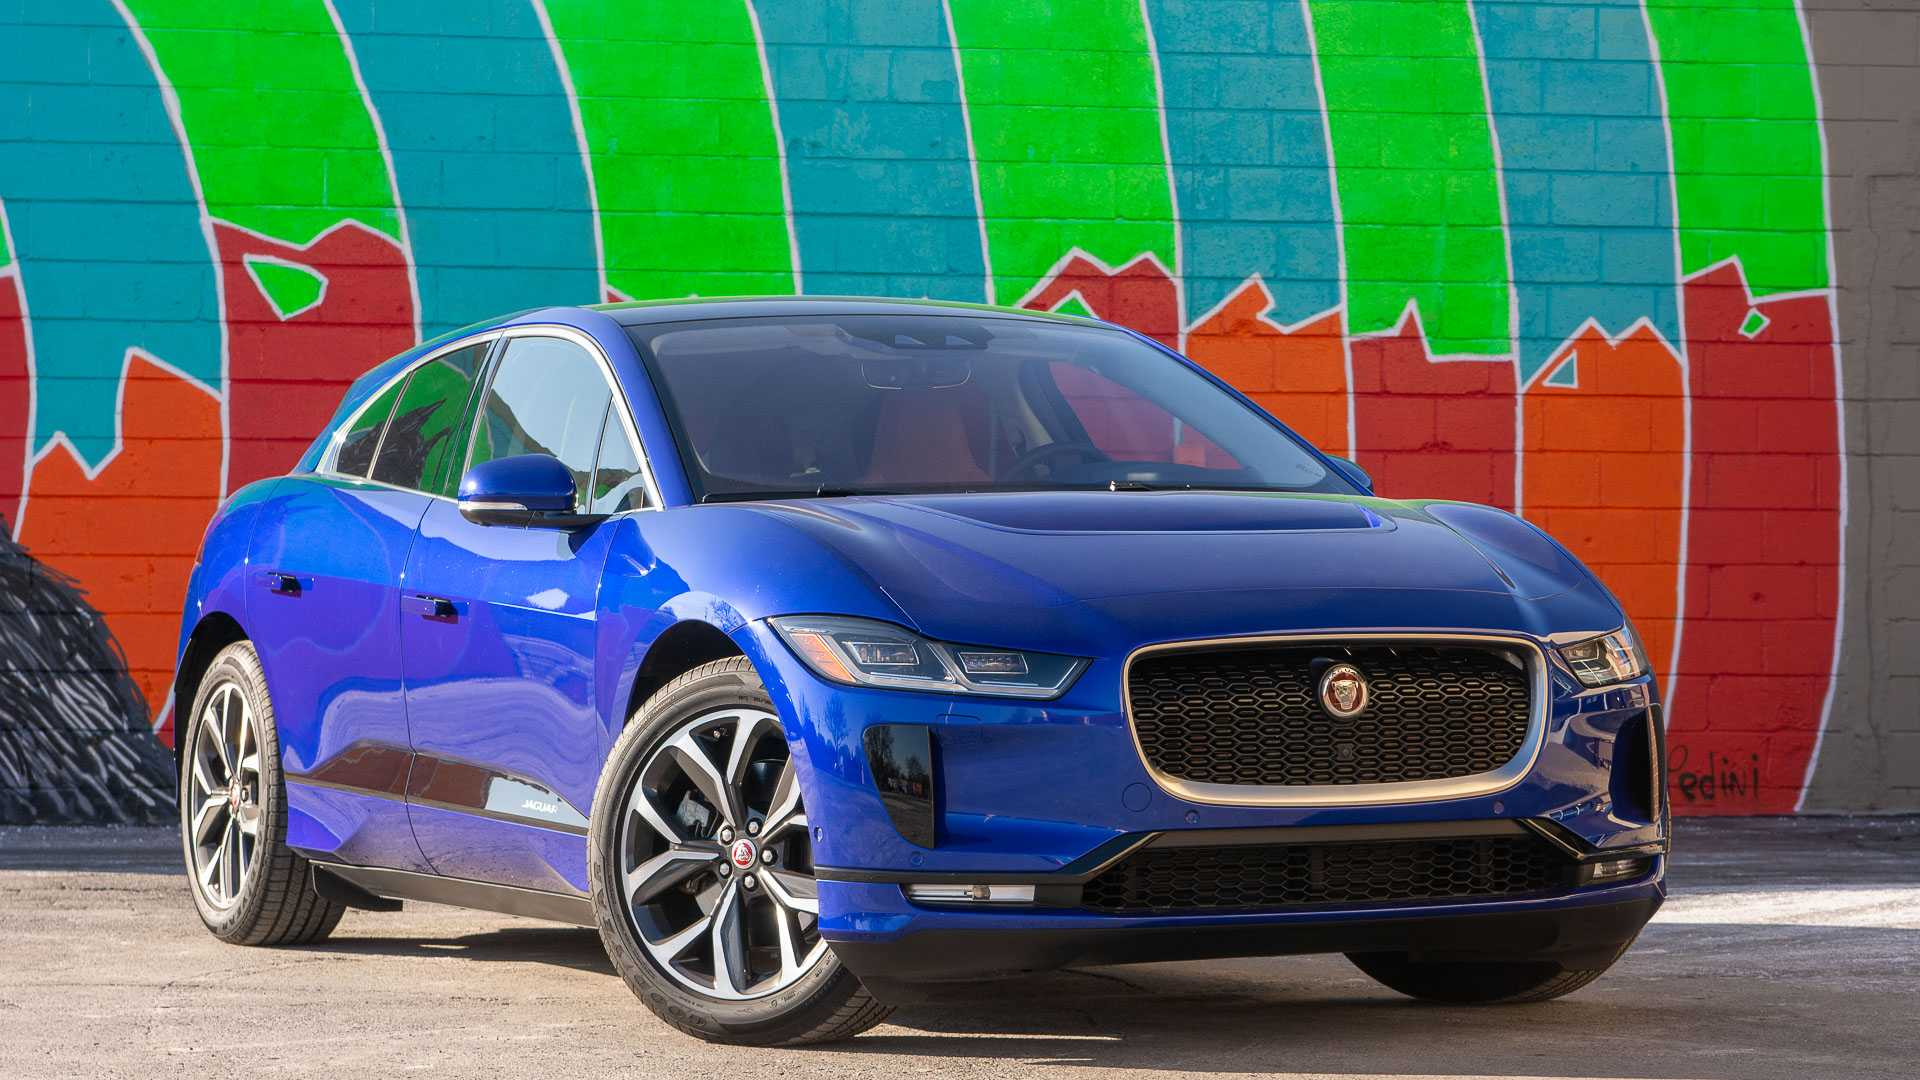 2019 Jaguar I-Pace EV: Design, Specs, Mileage, Price >> 2019 Jaguar I Pace Ev400 Hse Review Silent Stunner